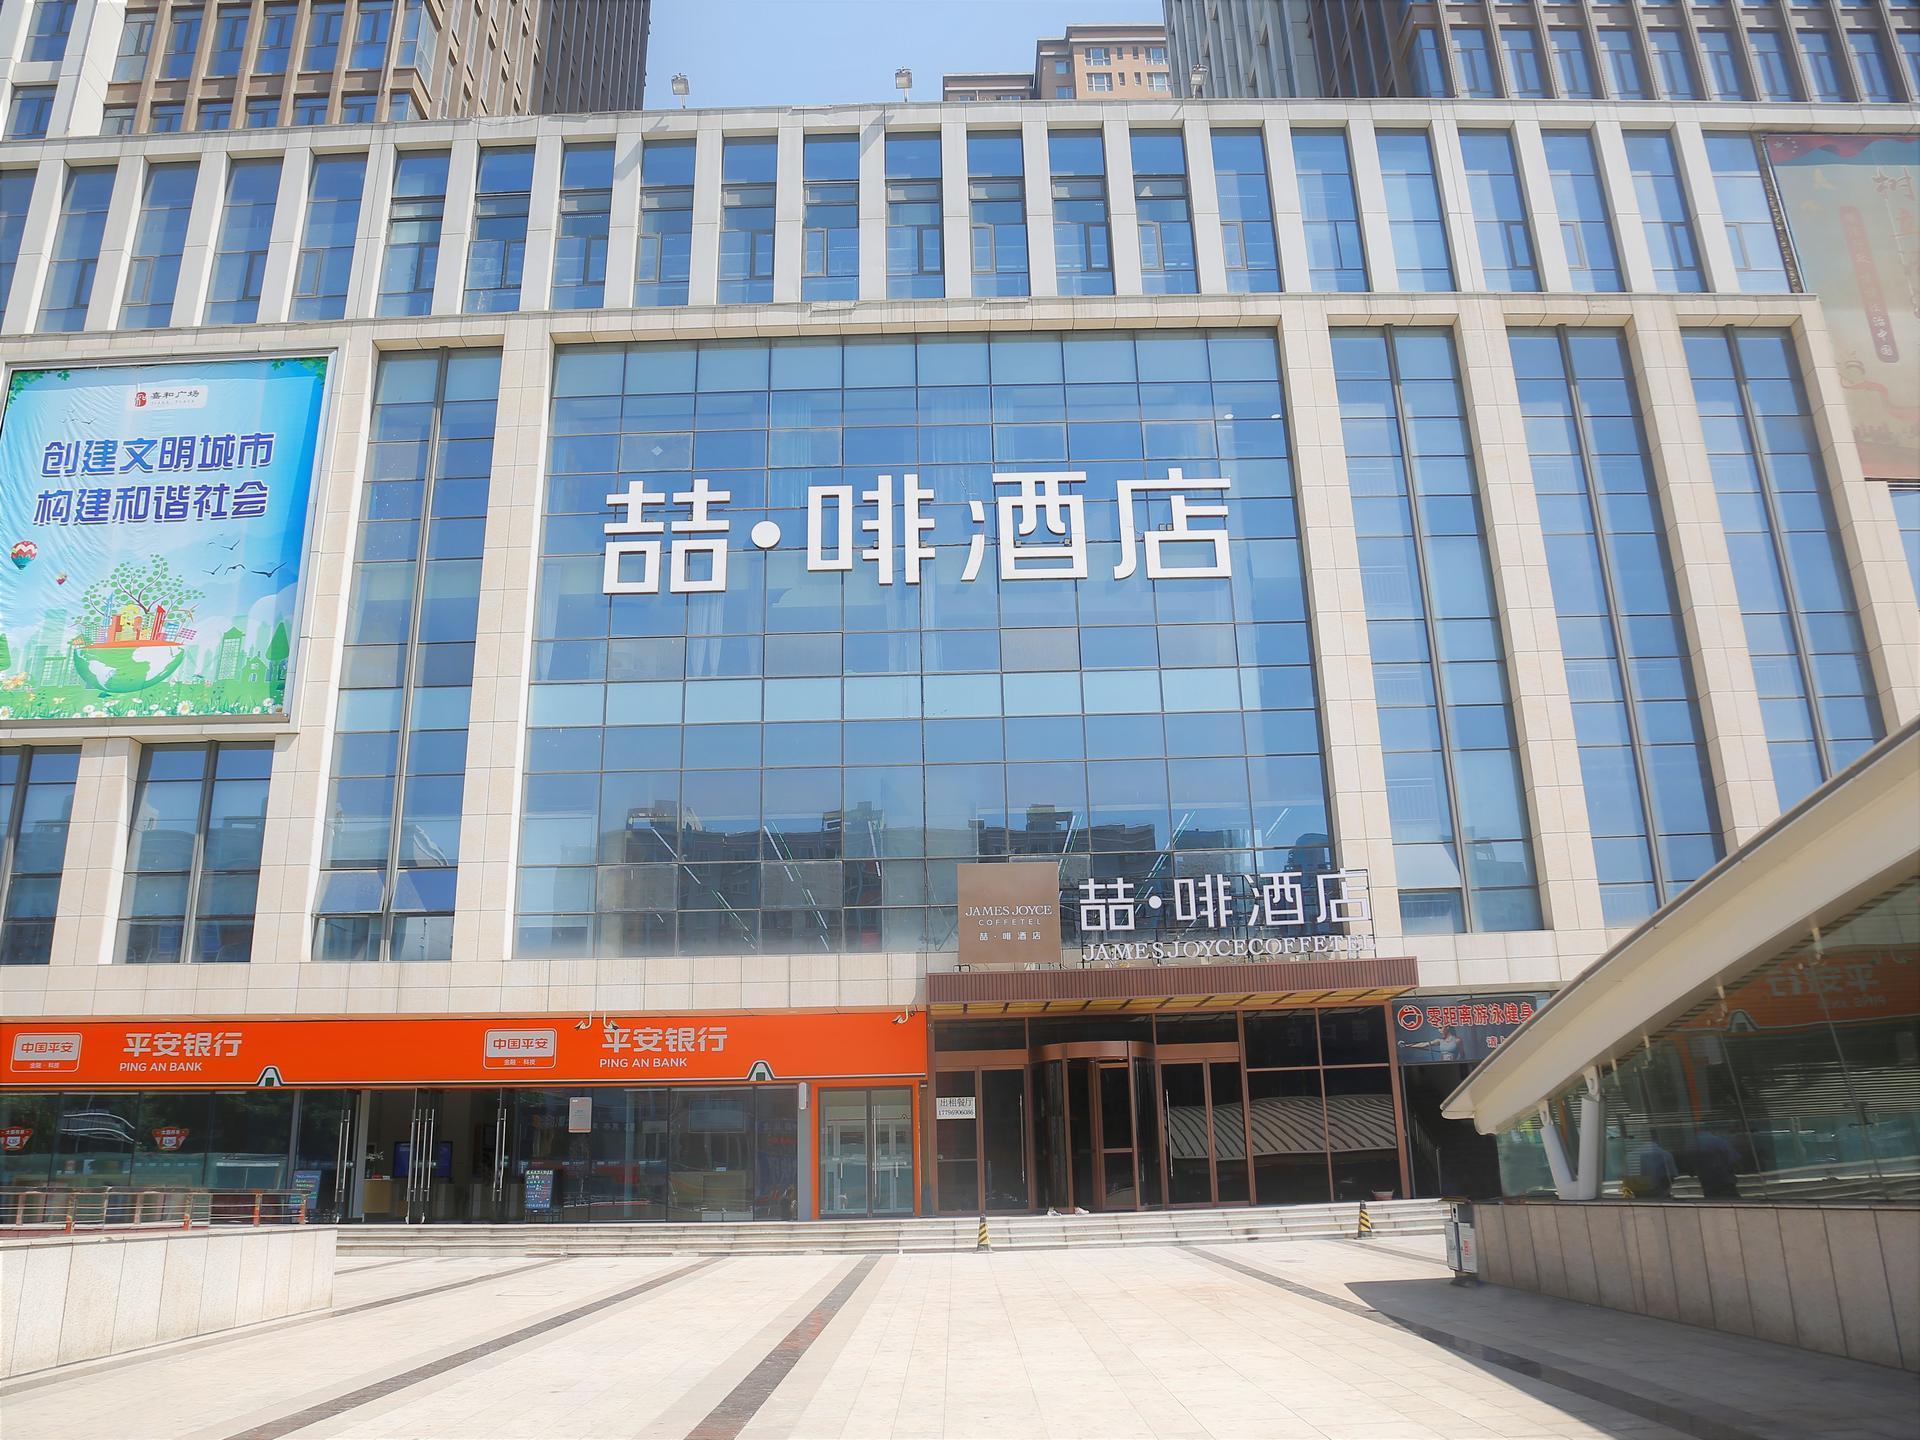 James Joyce Coffetel Shijiazhuang Wanda Plaza Tangu Metro Station